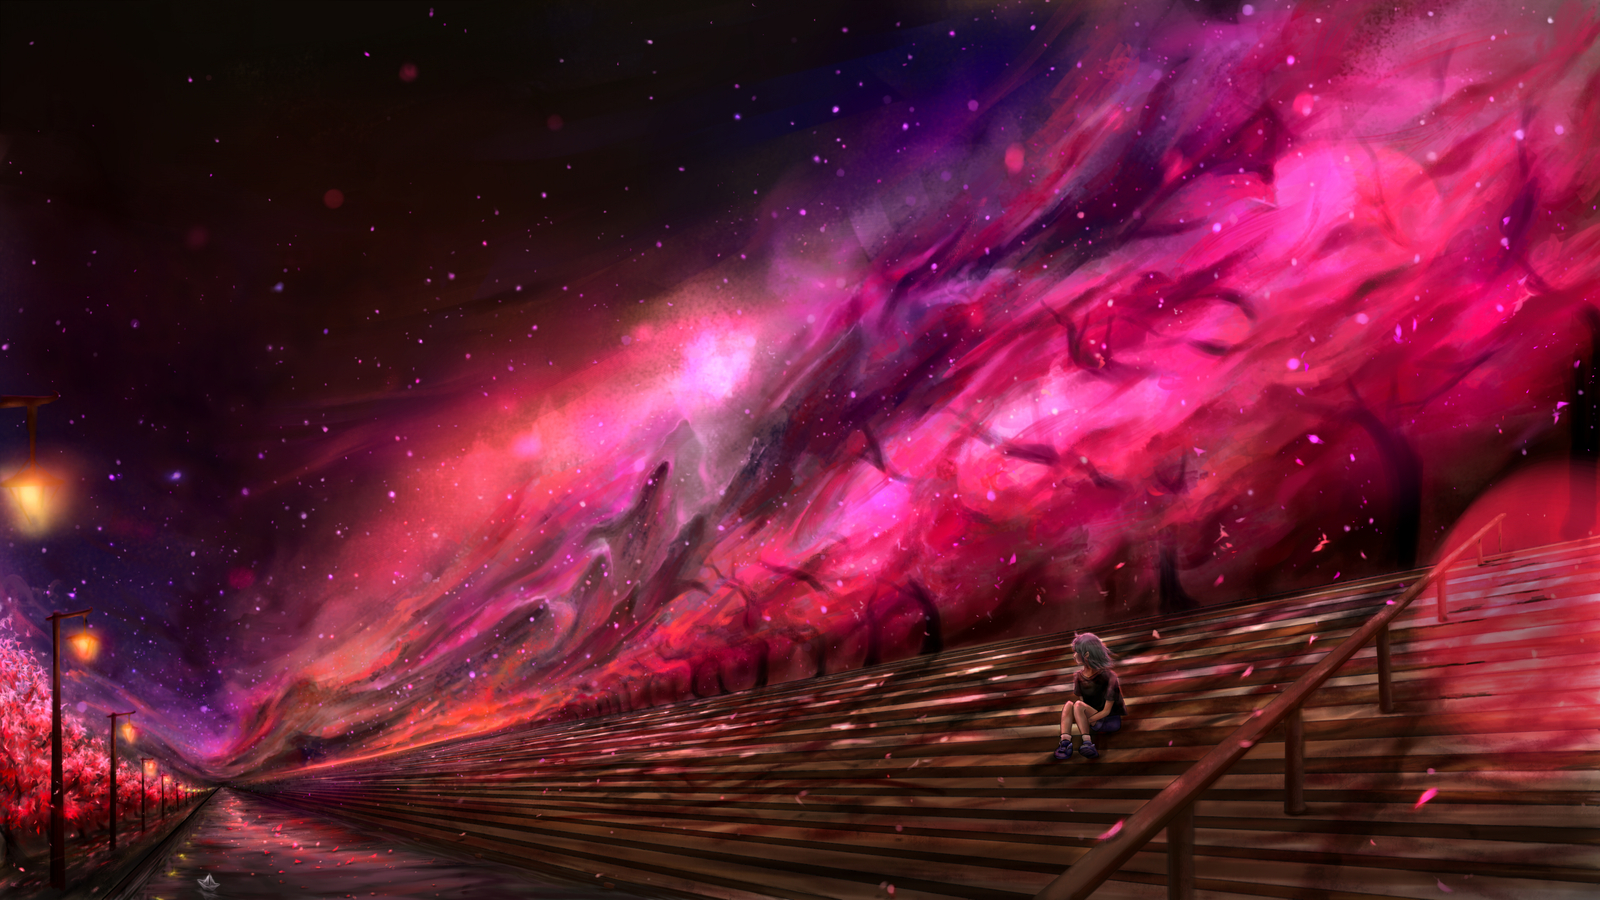 nebula-sakura-cherry-blossom-galaxy-4k-1c.jpg